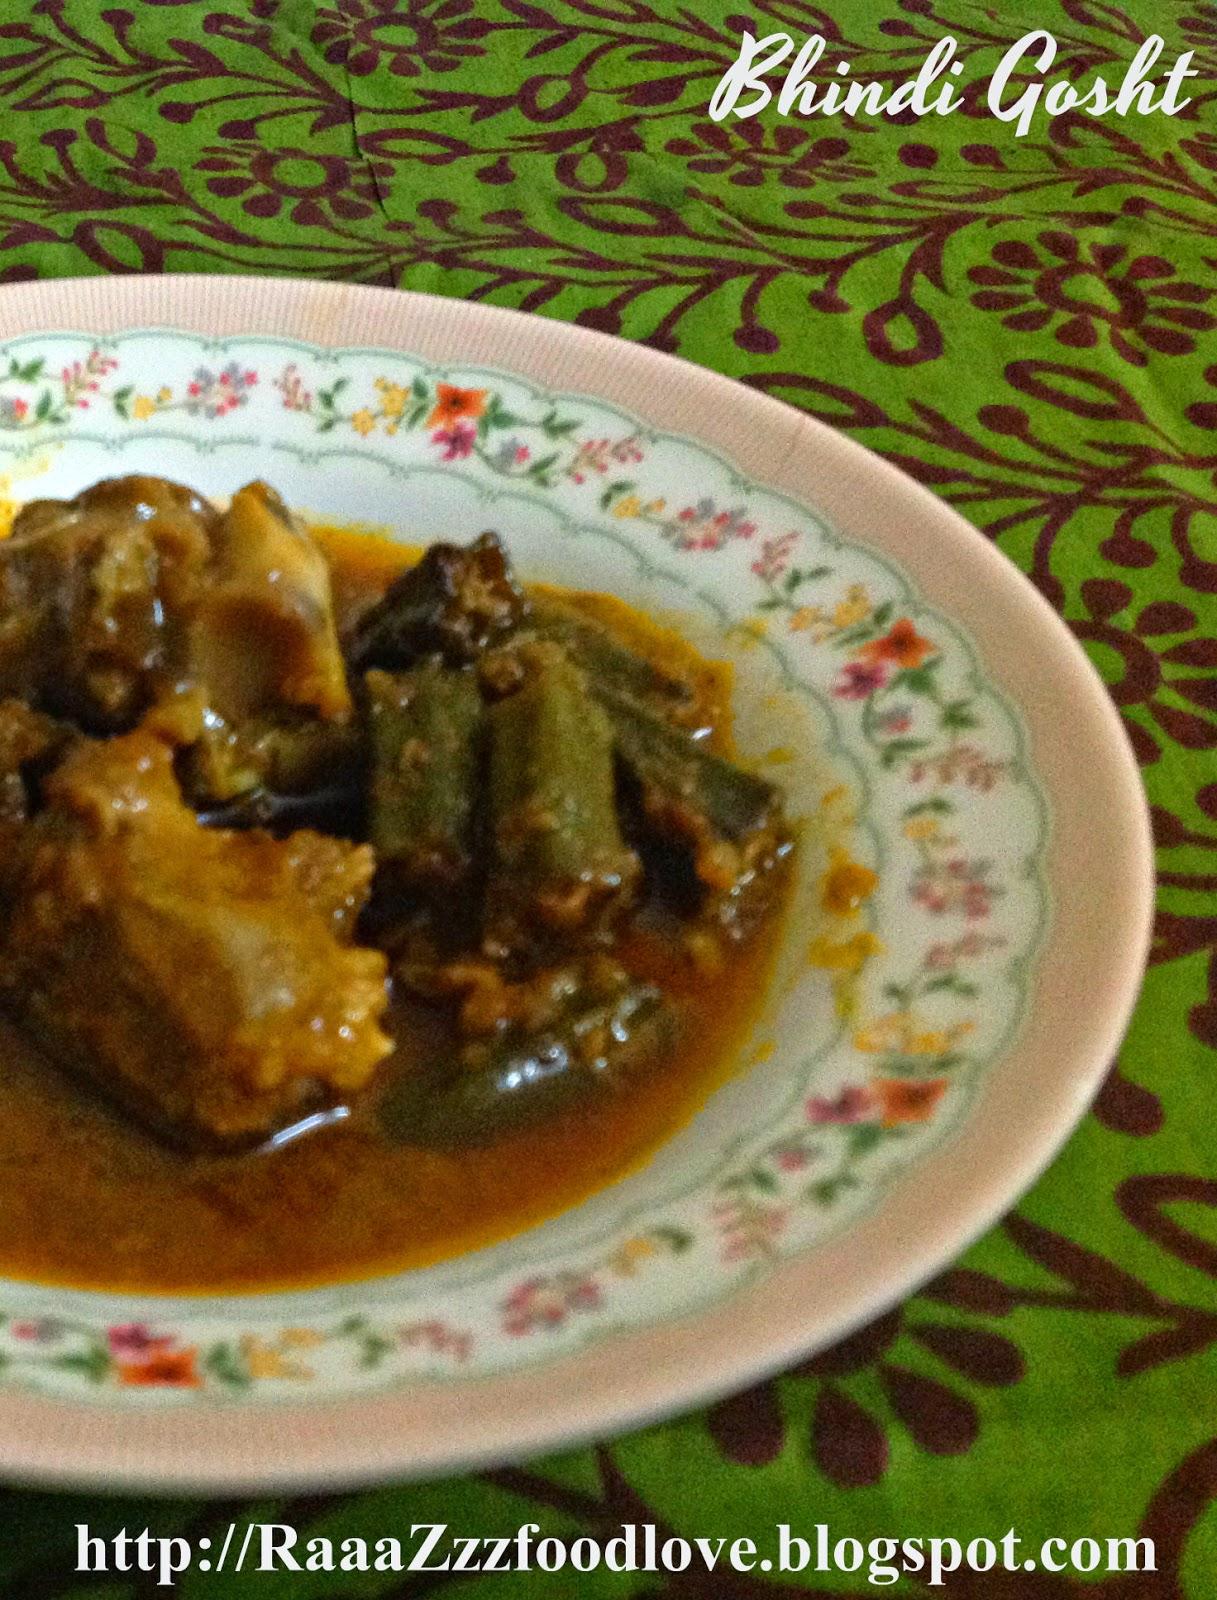 http://raaazzzfoodlove.blogspot.in/2014/08/bhindi-gosht-okra-and-mutton-curry.html